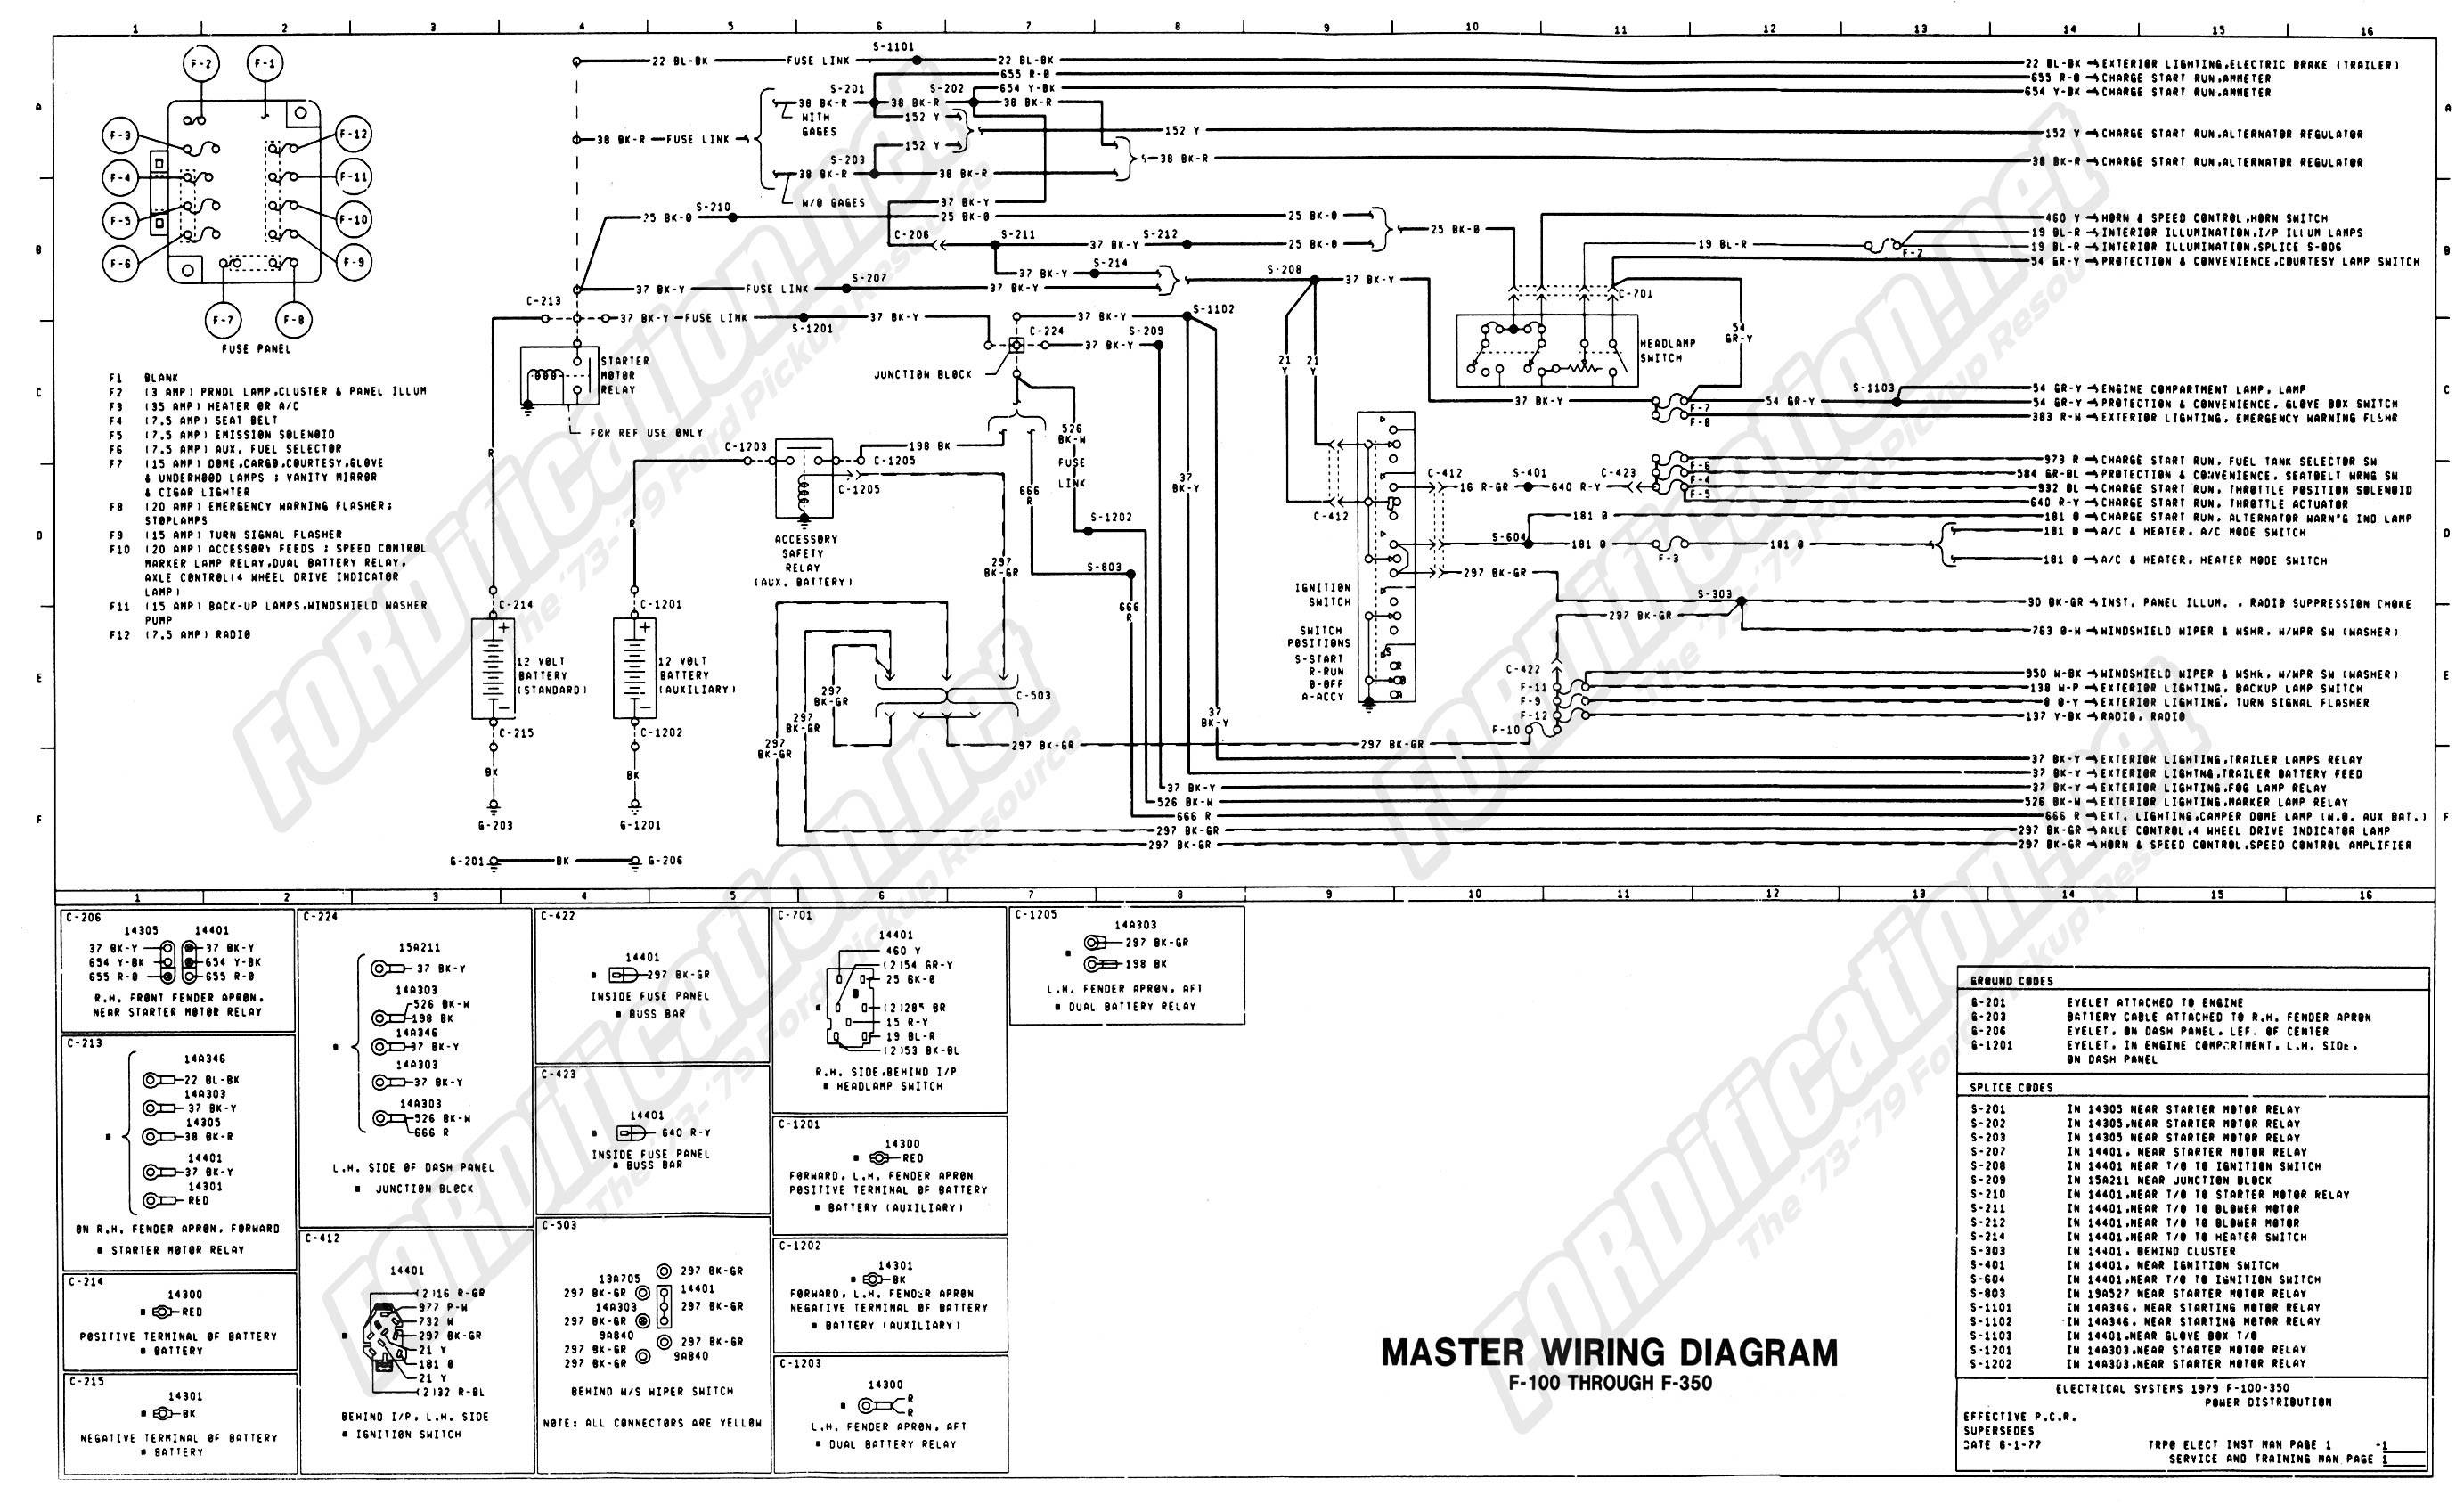 2009 Silverado Wiring Diagram Wiring 79master 1of9 for 79 Chevy Truck Diagram Wiring Diagram Of 2009 Silverado Wiring Diagram